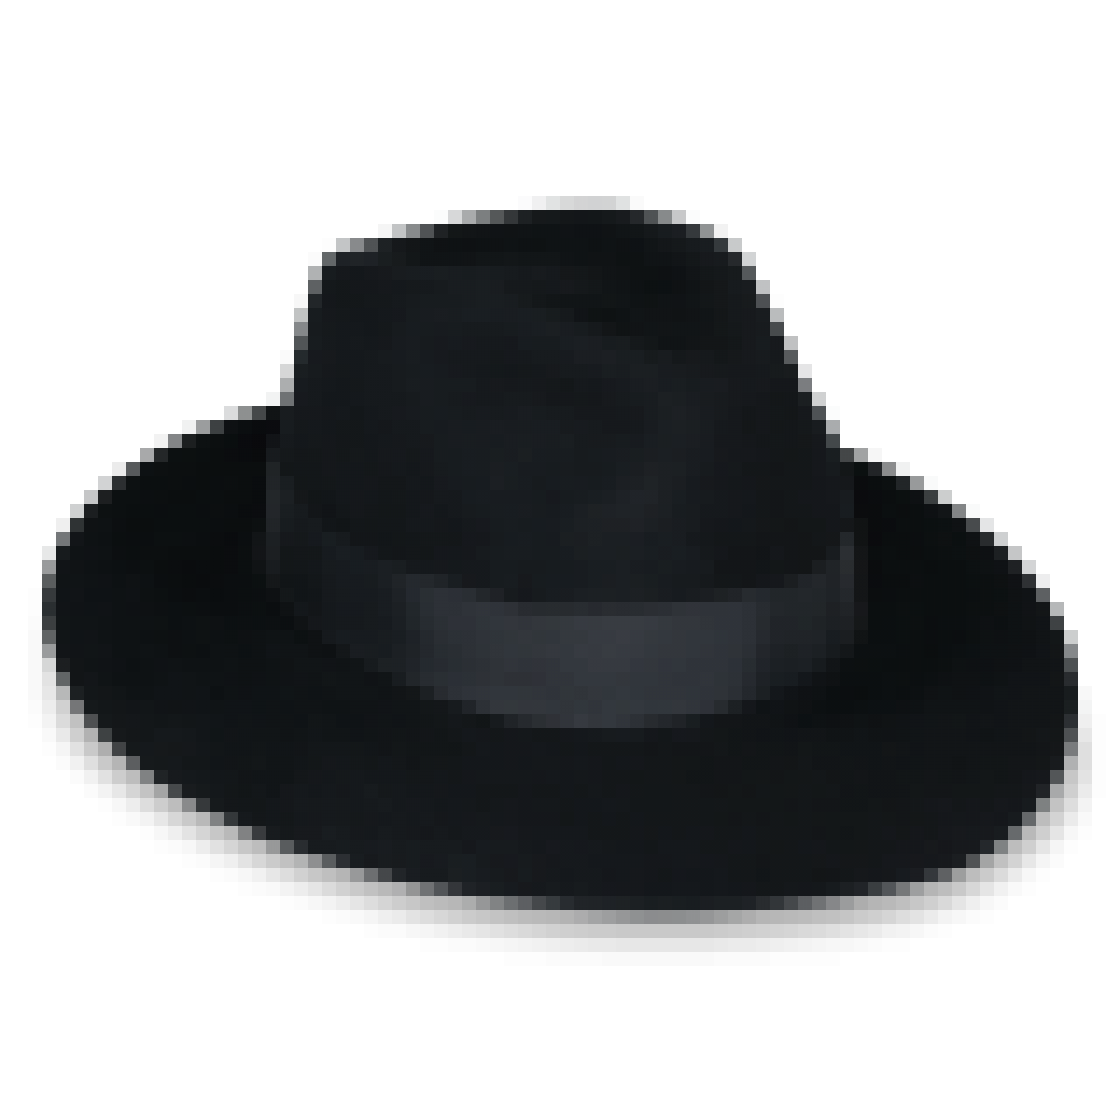 Fedora clipart indiana jones hat. Png transparent images pluspng